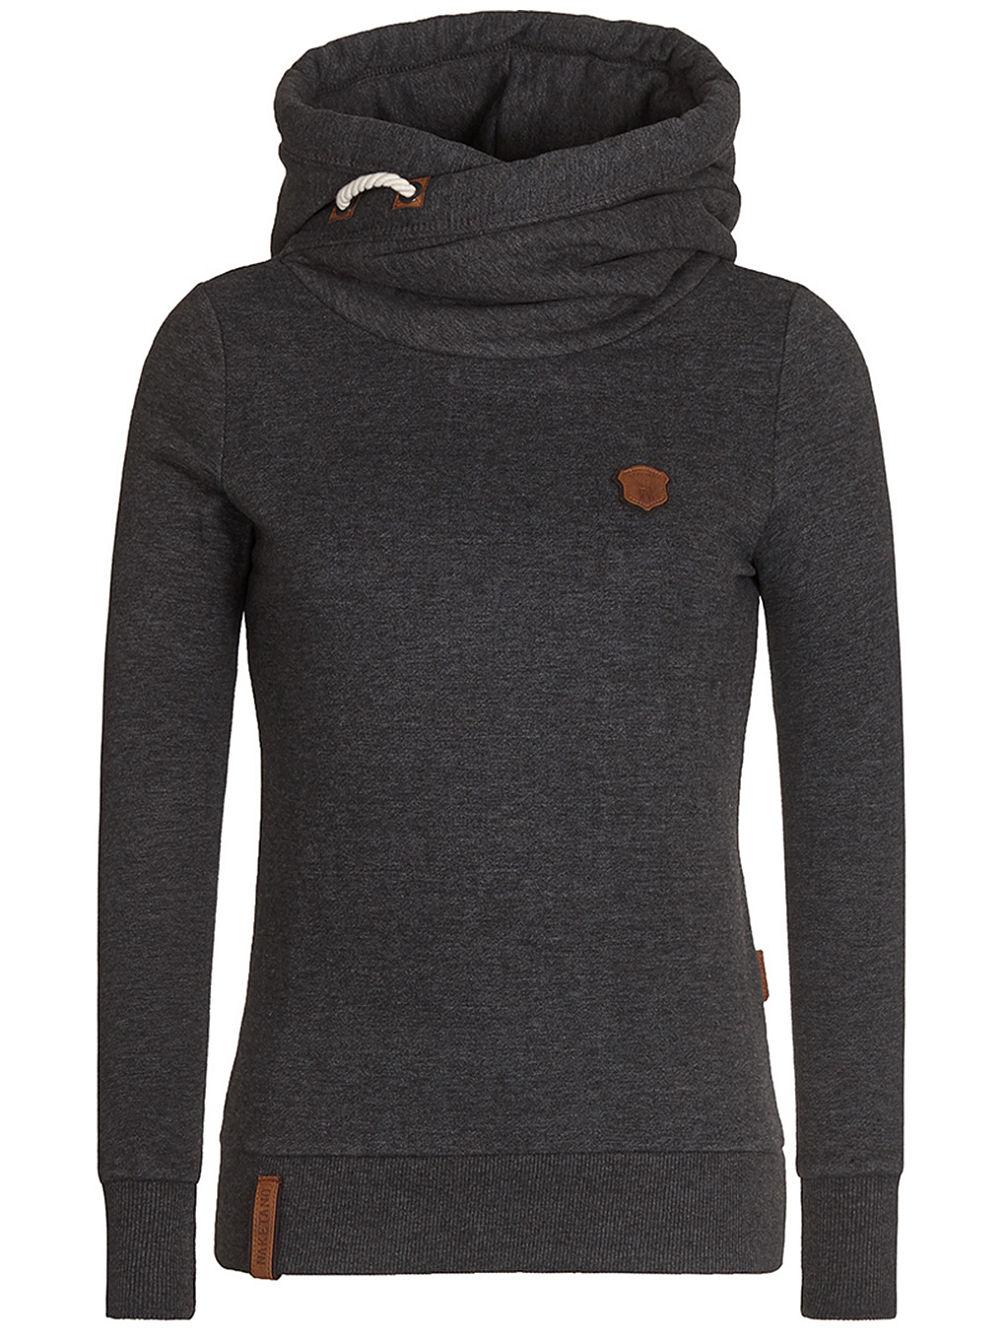 naketano-trust-my-rage-pimped-ii-hoodie